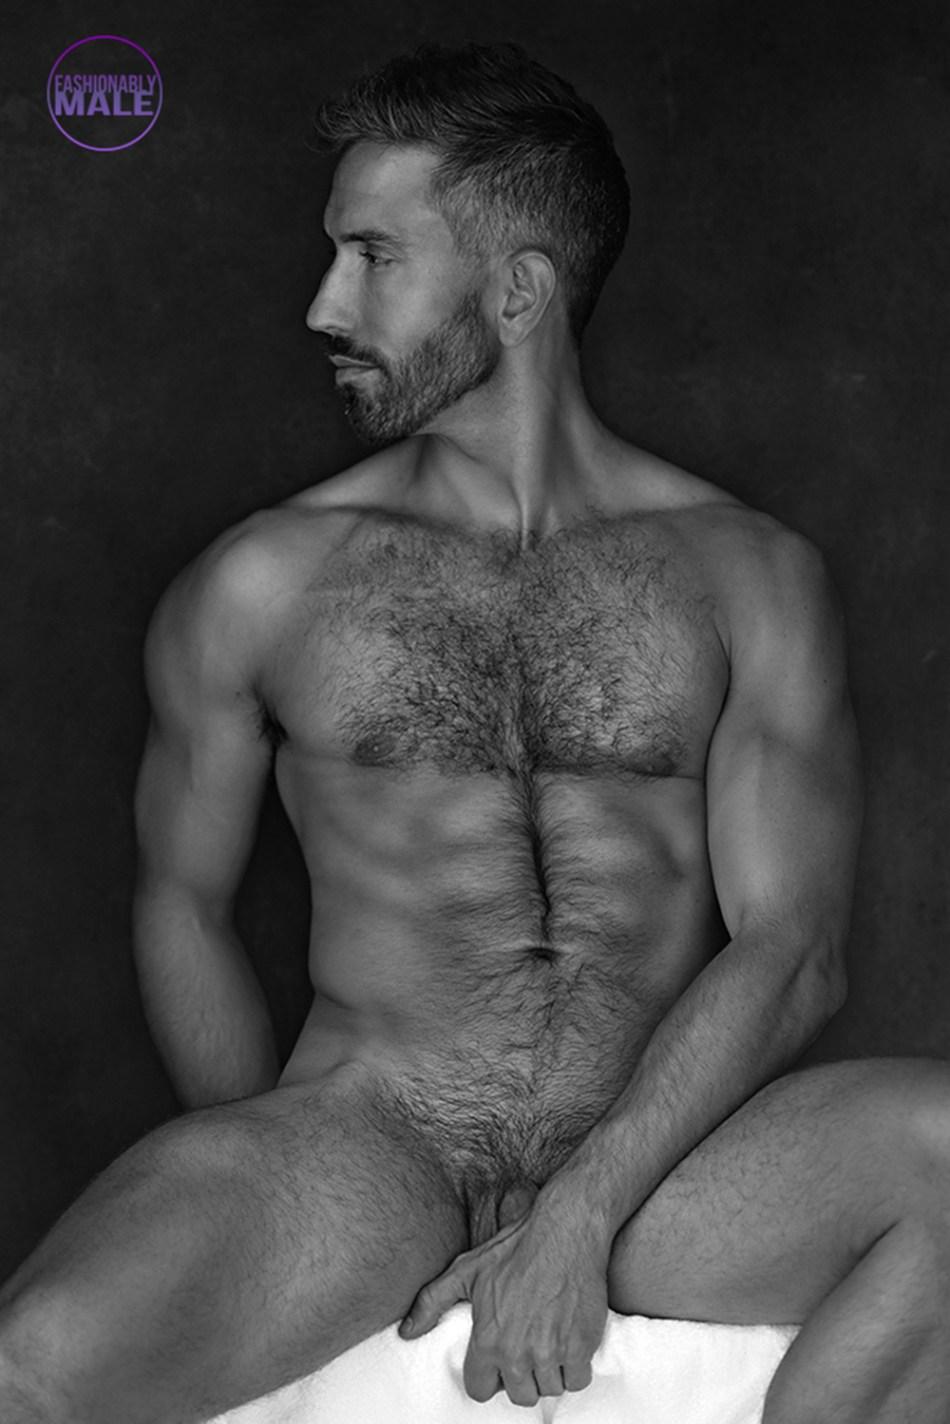 Stephane Marti by Shotsbygun for Fashionably Male10